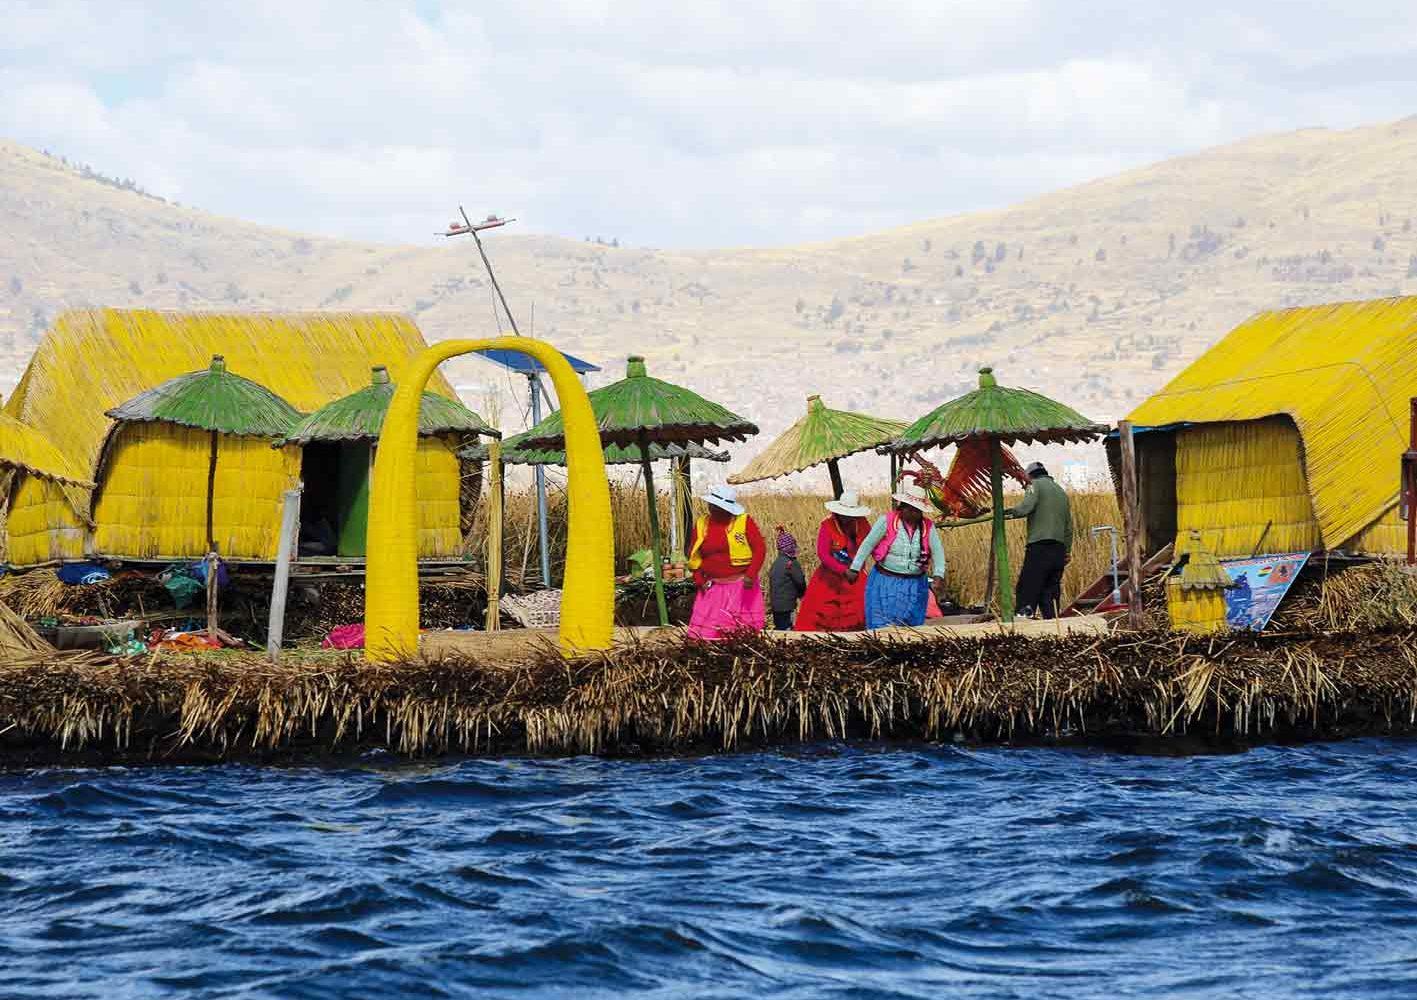 Uros am Titicaca-See, 7. Reisetag